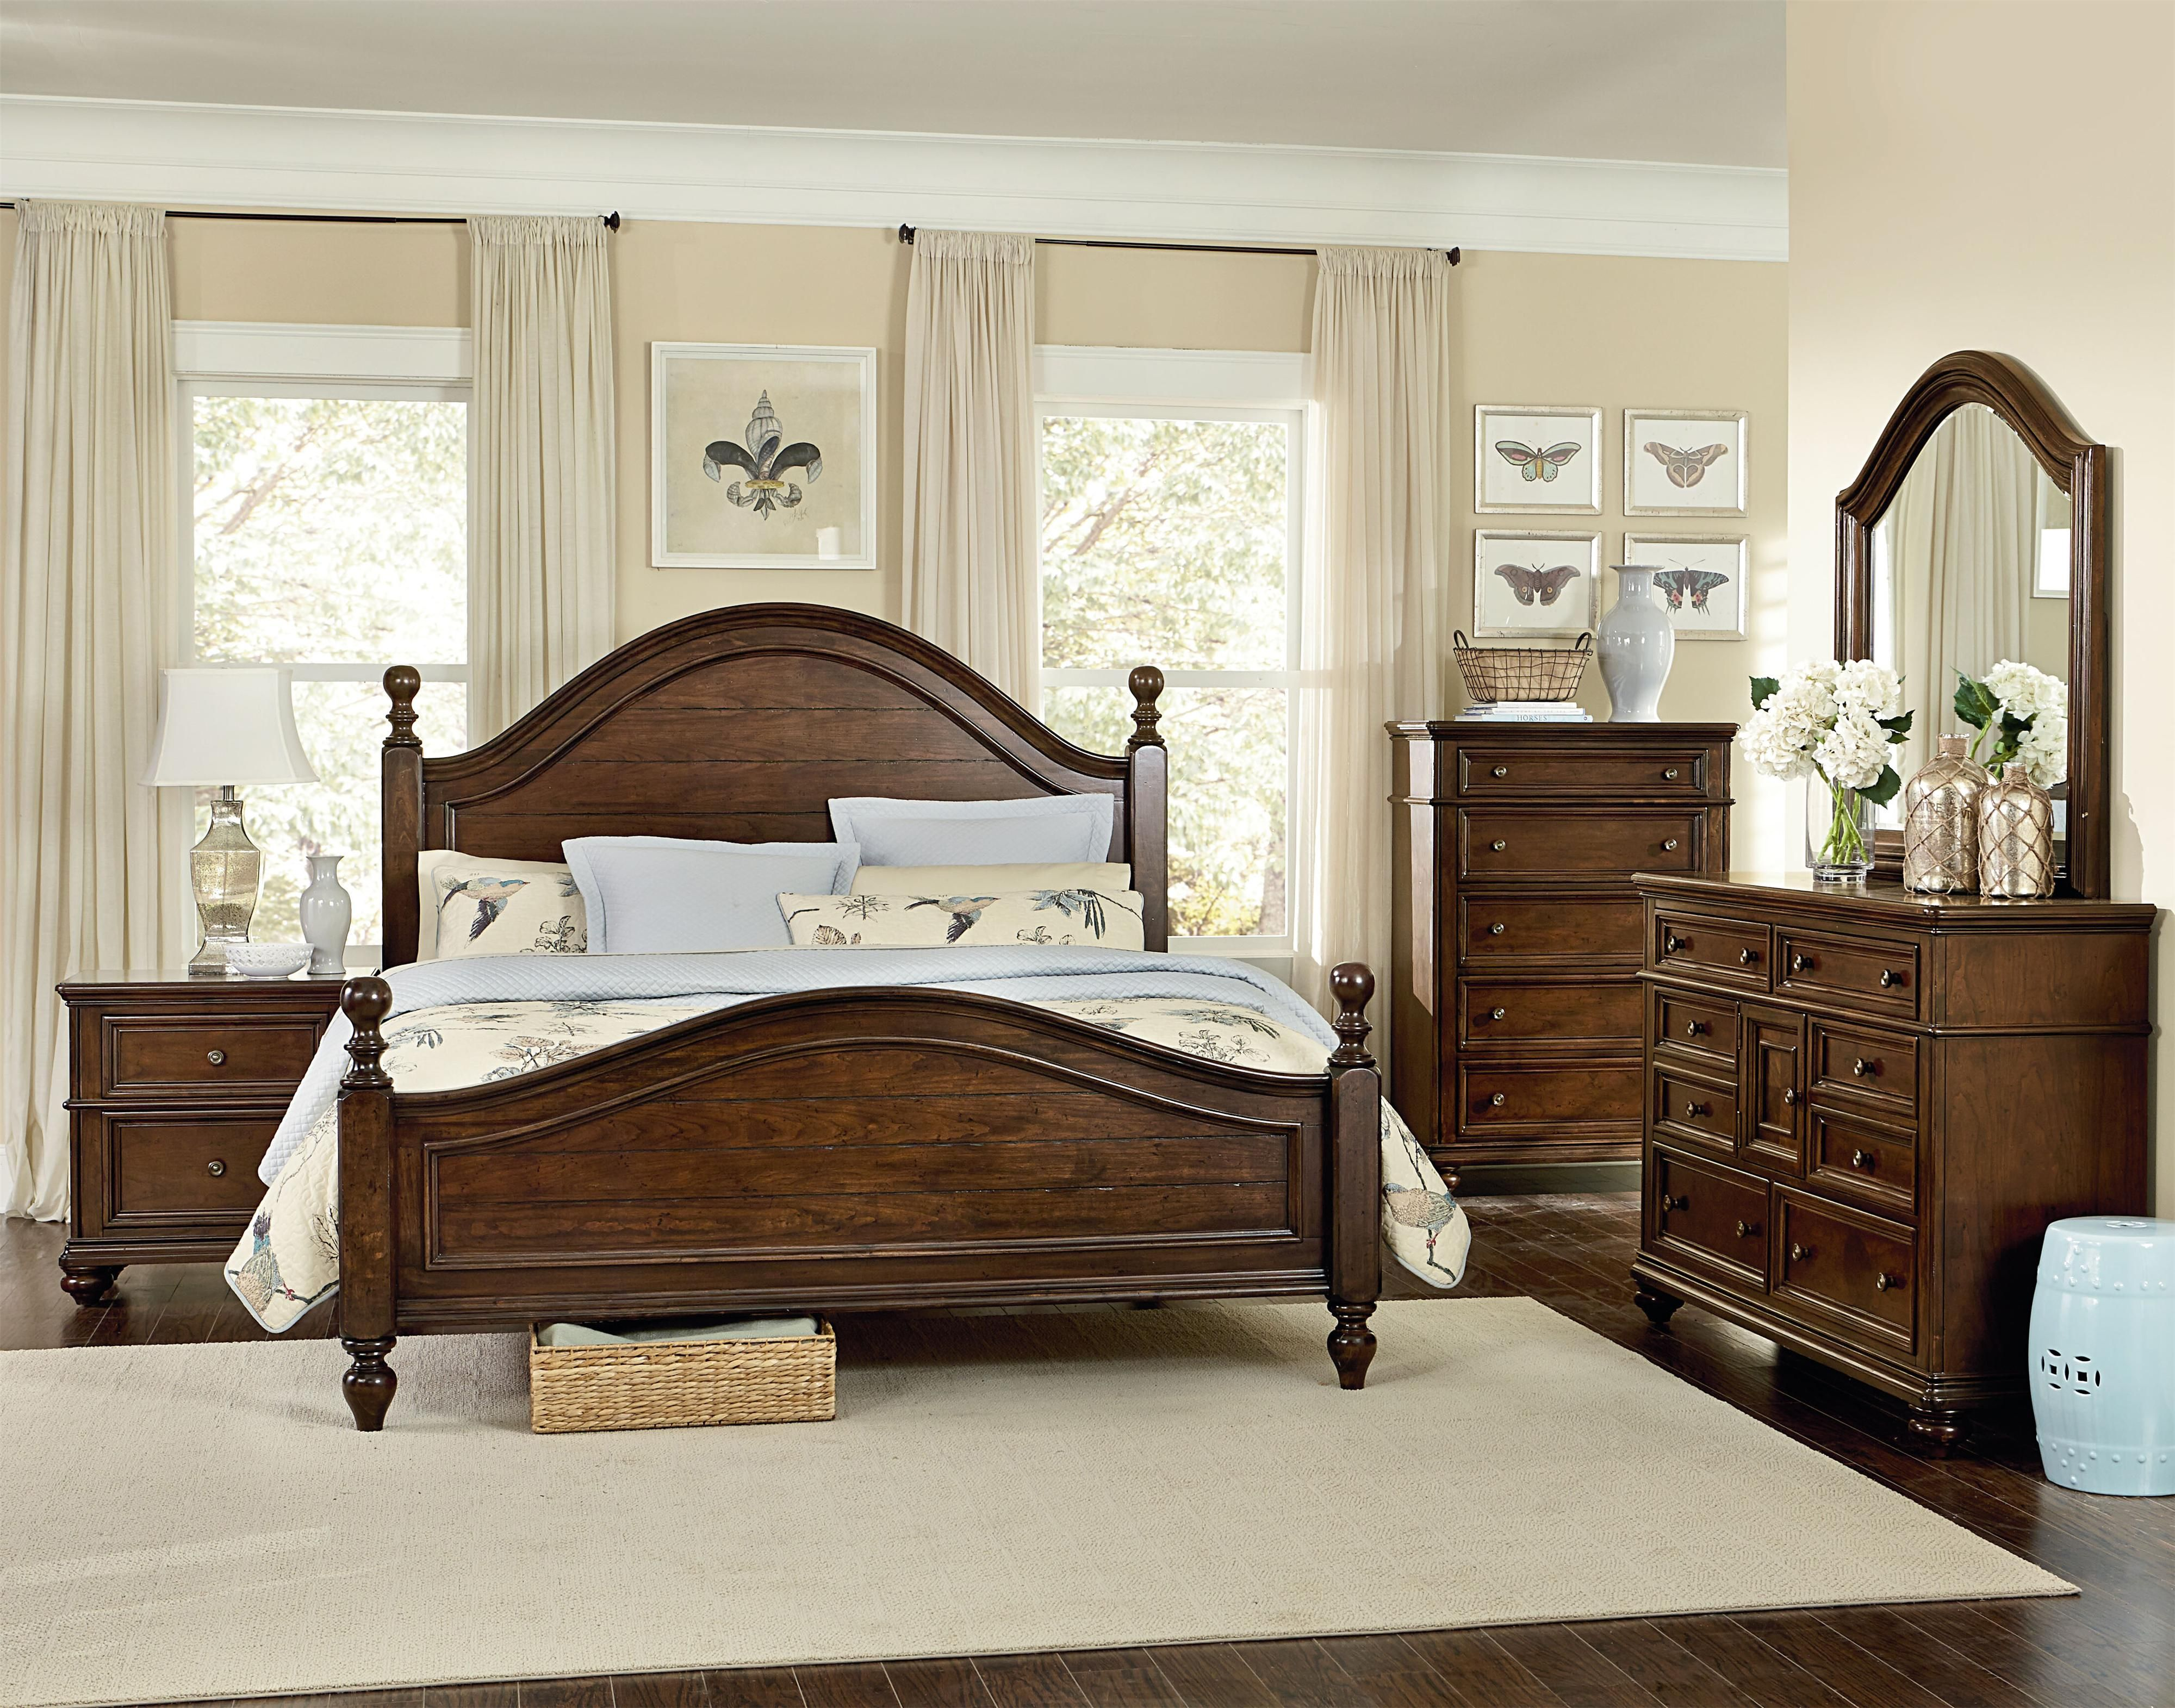 Heritage King Bedroom Group By Standard Furniture Bedroom Sets Queen Bedroom Set King Bedroom Sets